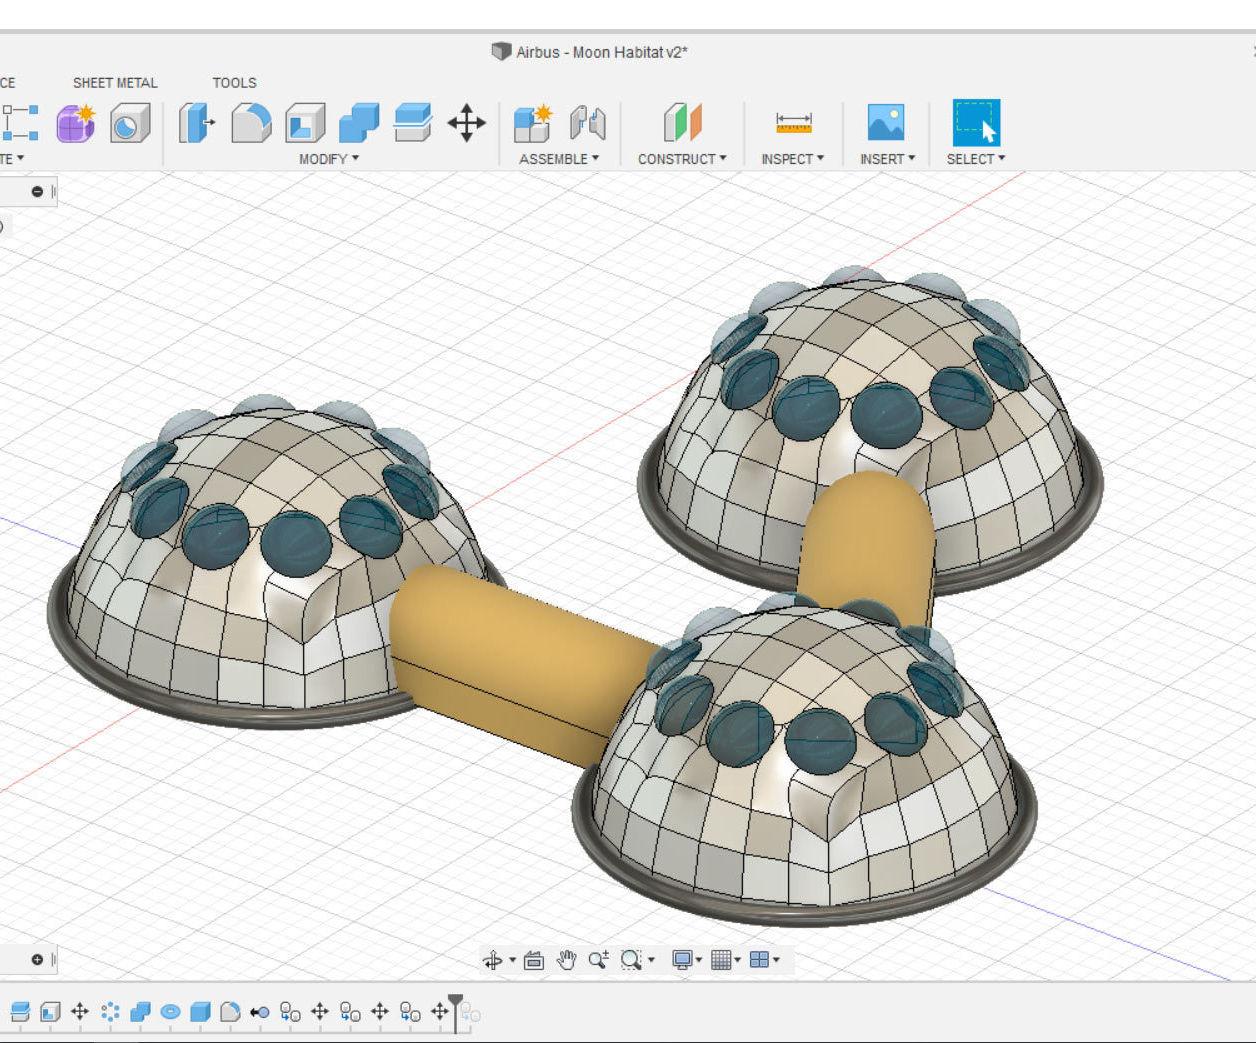 Design a Moon Habitat in Fusion 360